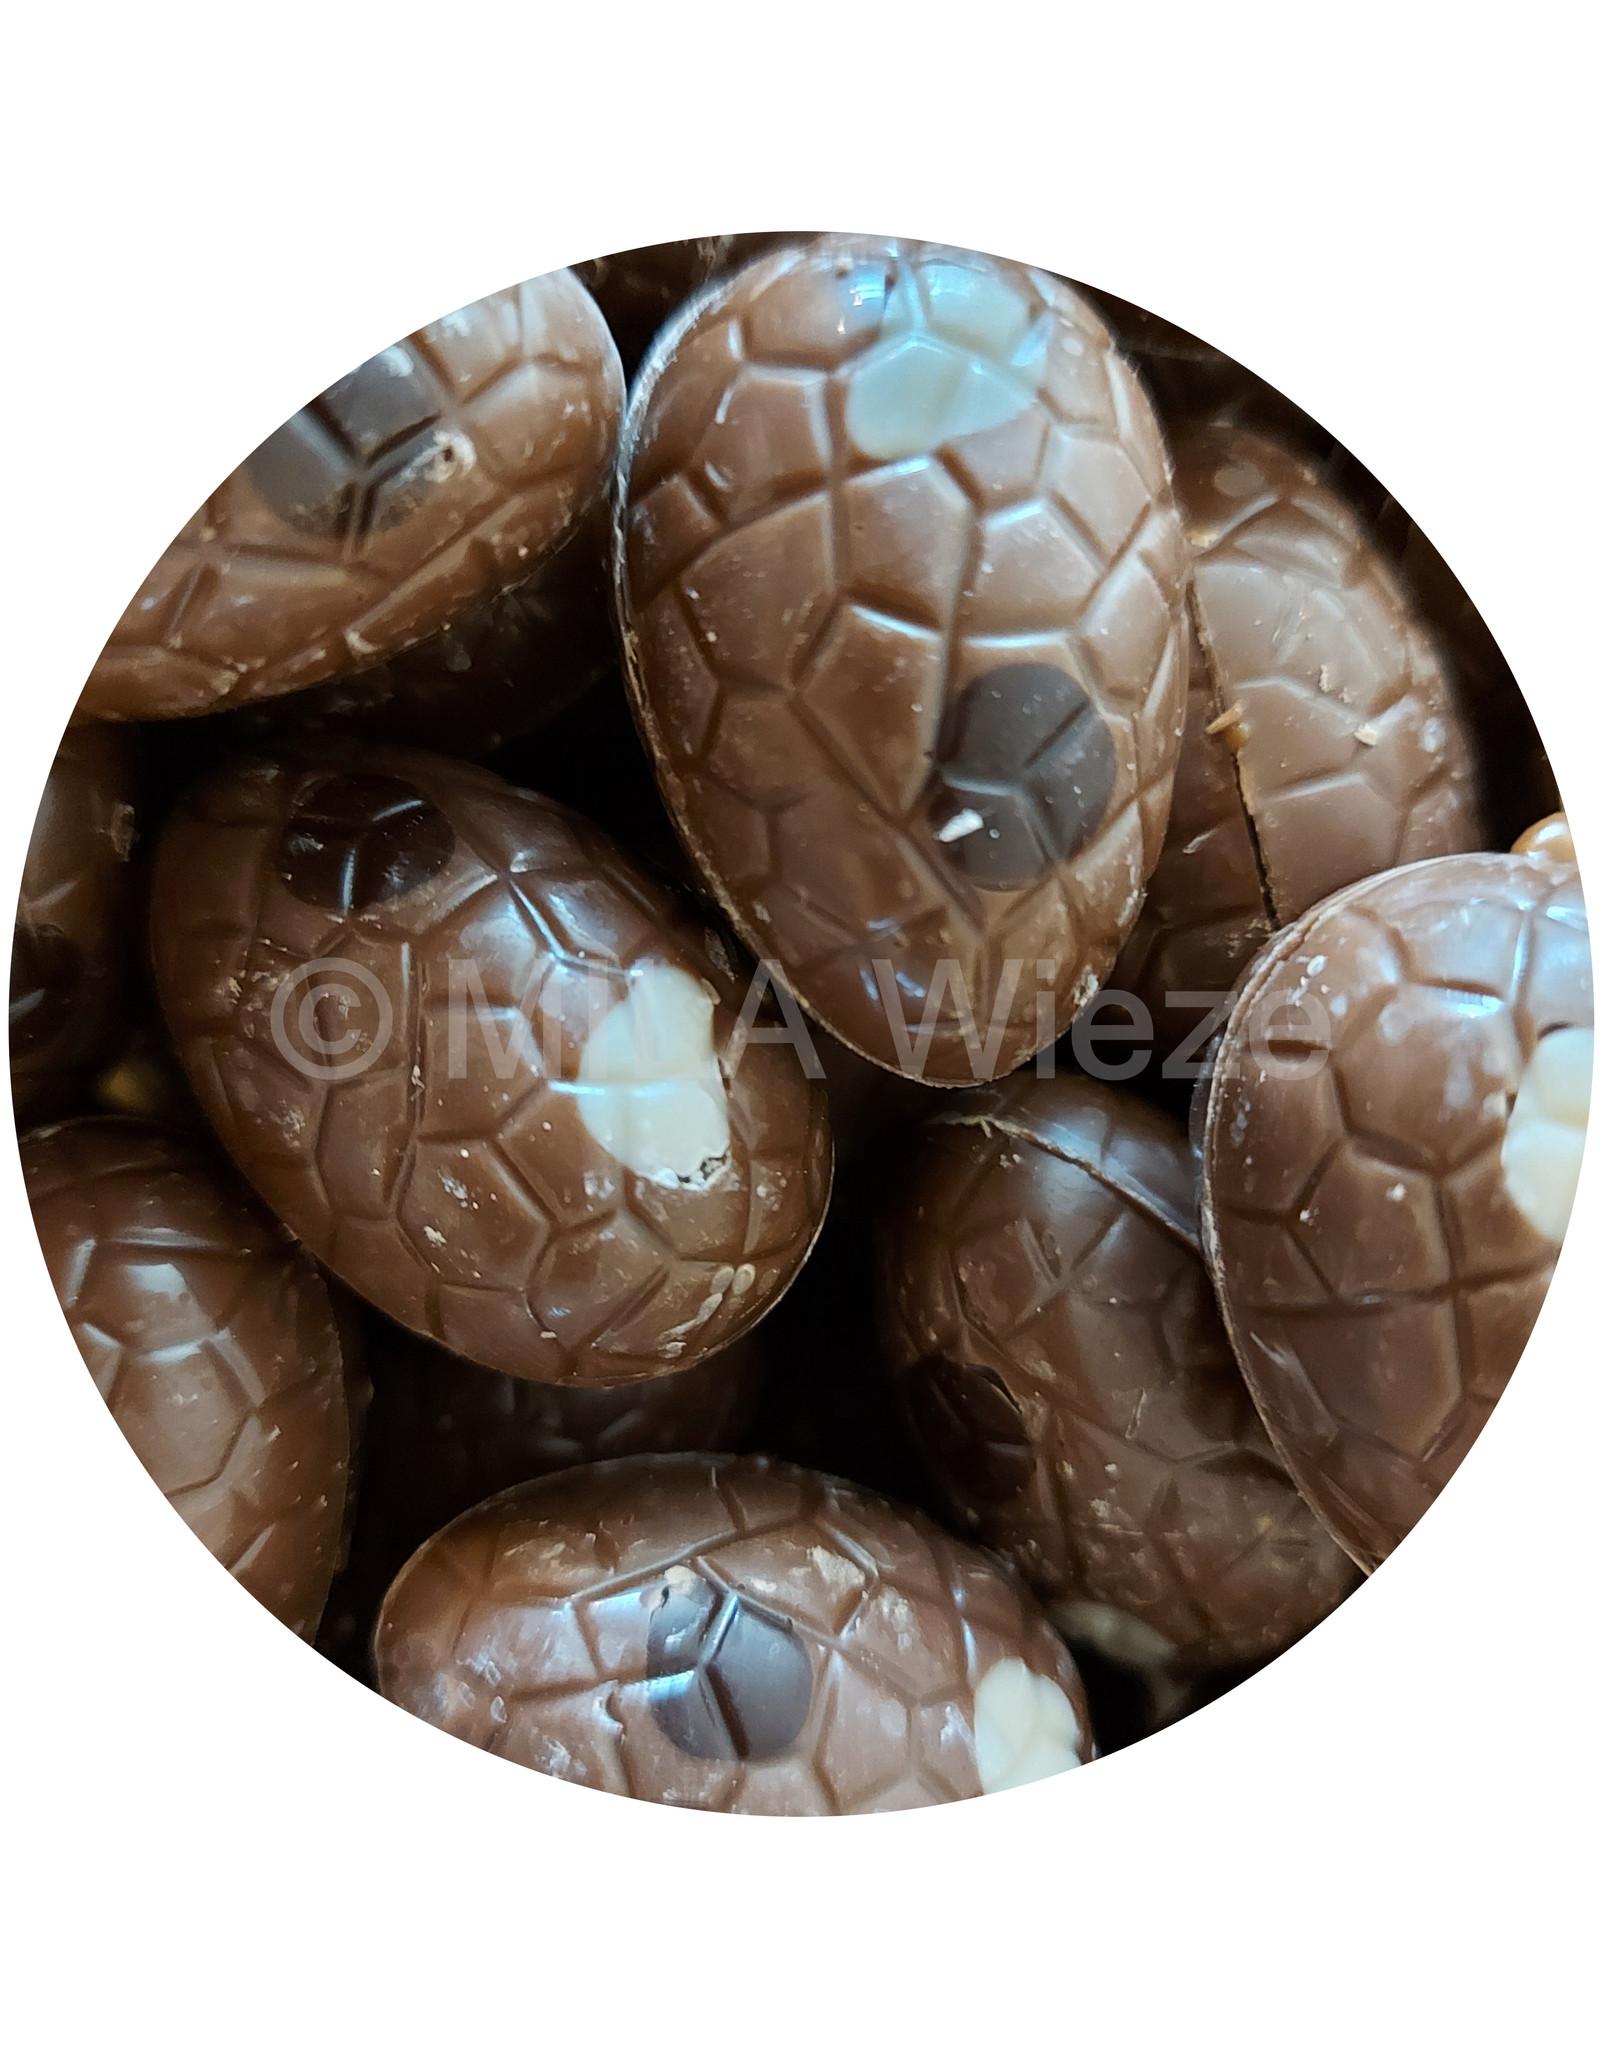 Paaseitjes Deco - Melk - Toffee caramel